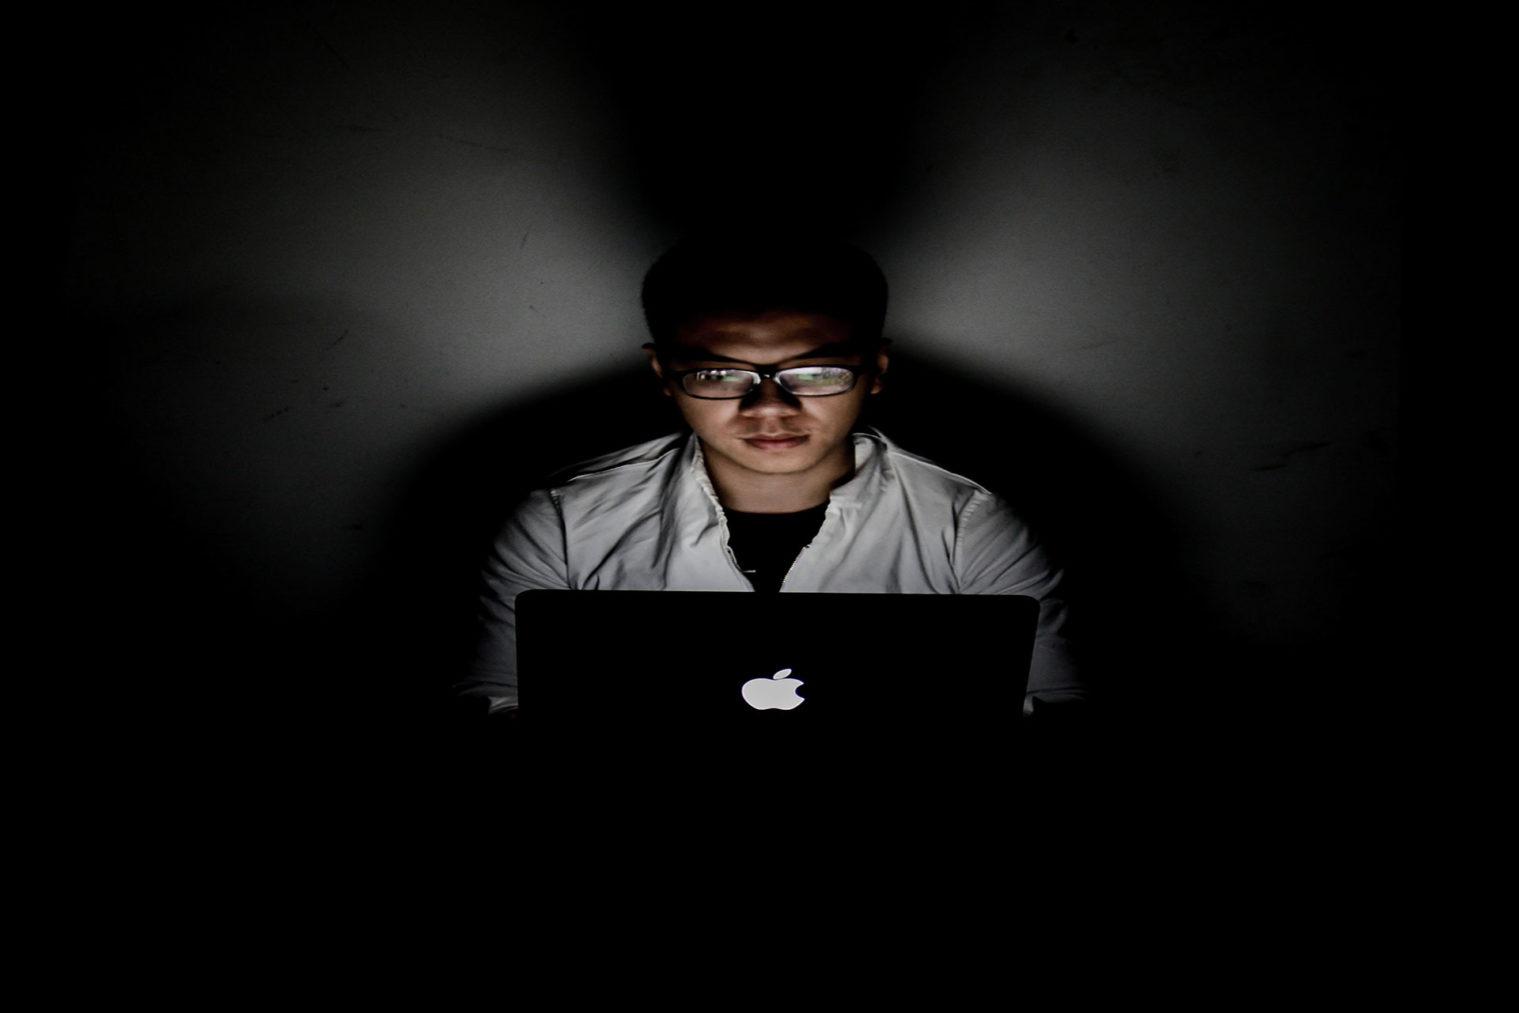 Falsos influencers, 5 consejos para detectarlos.